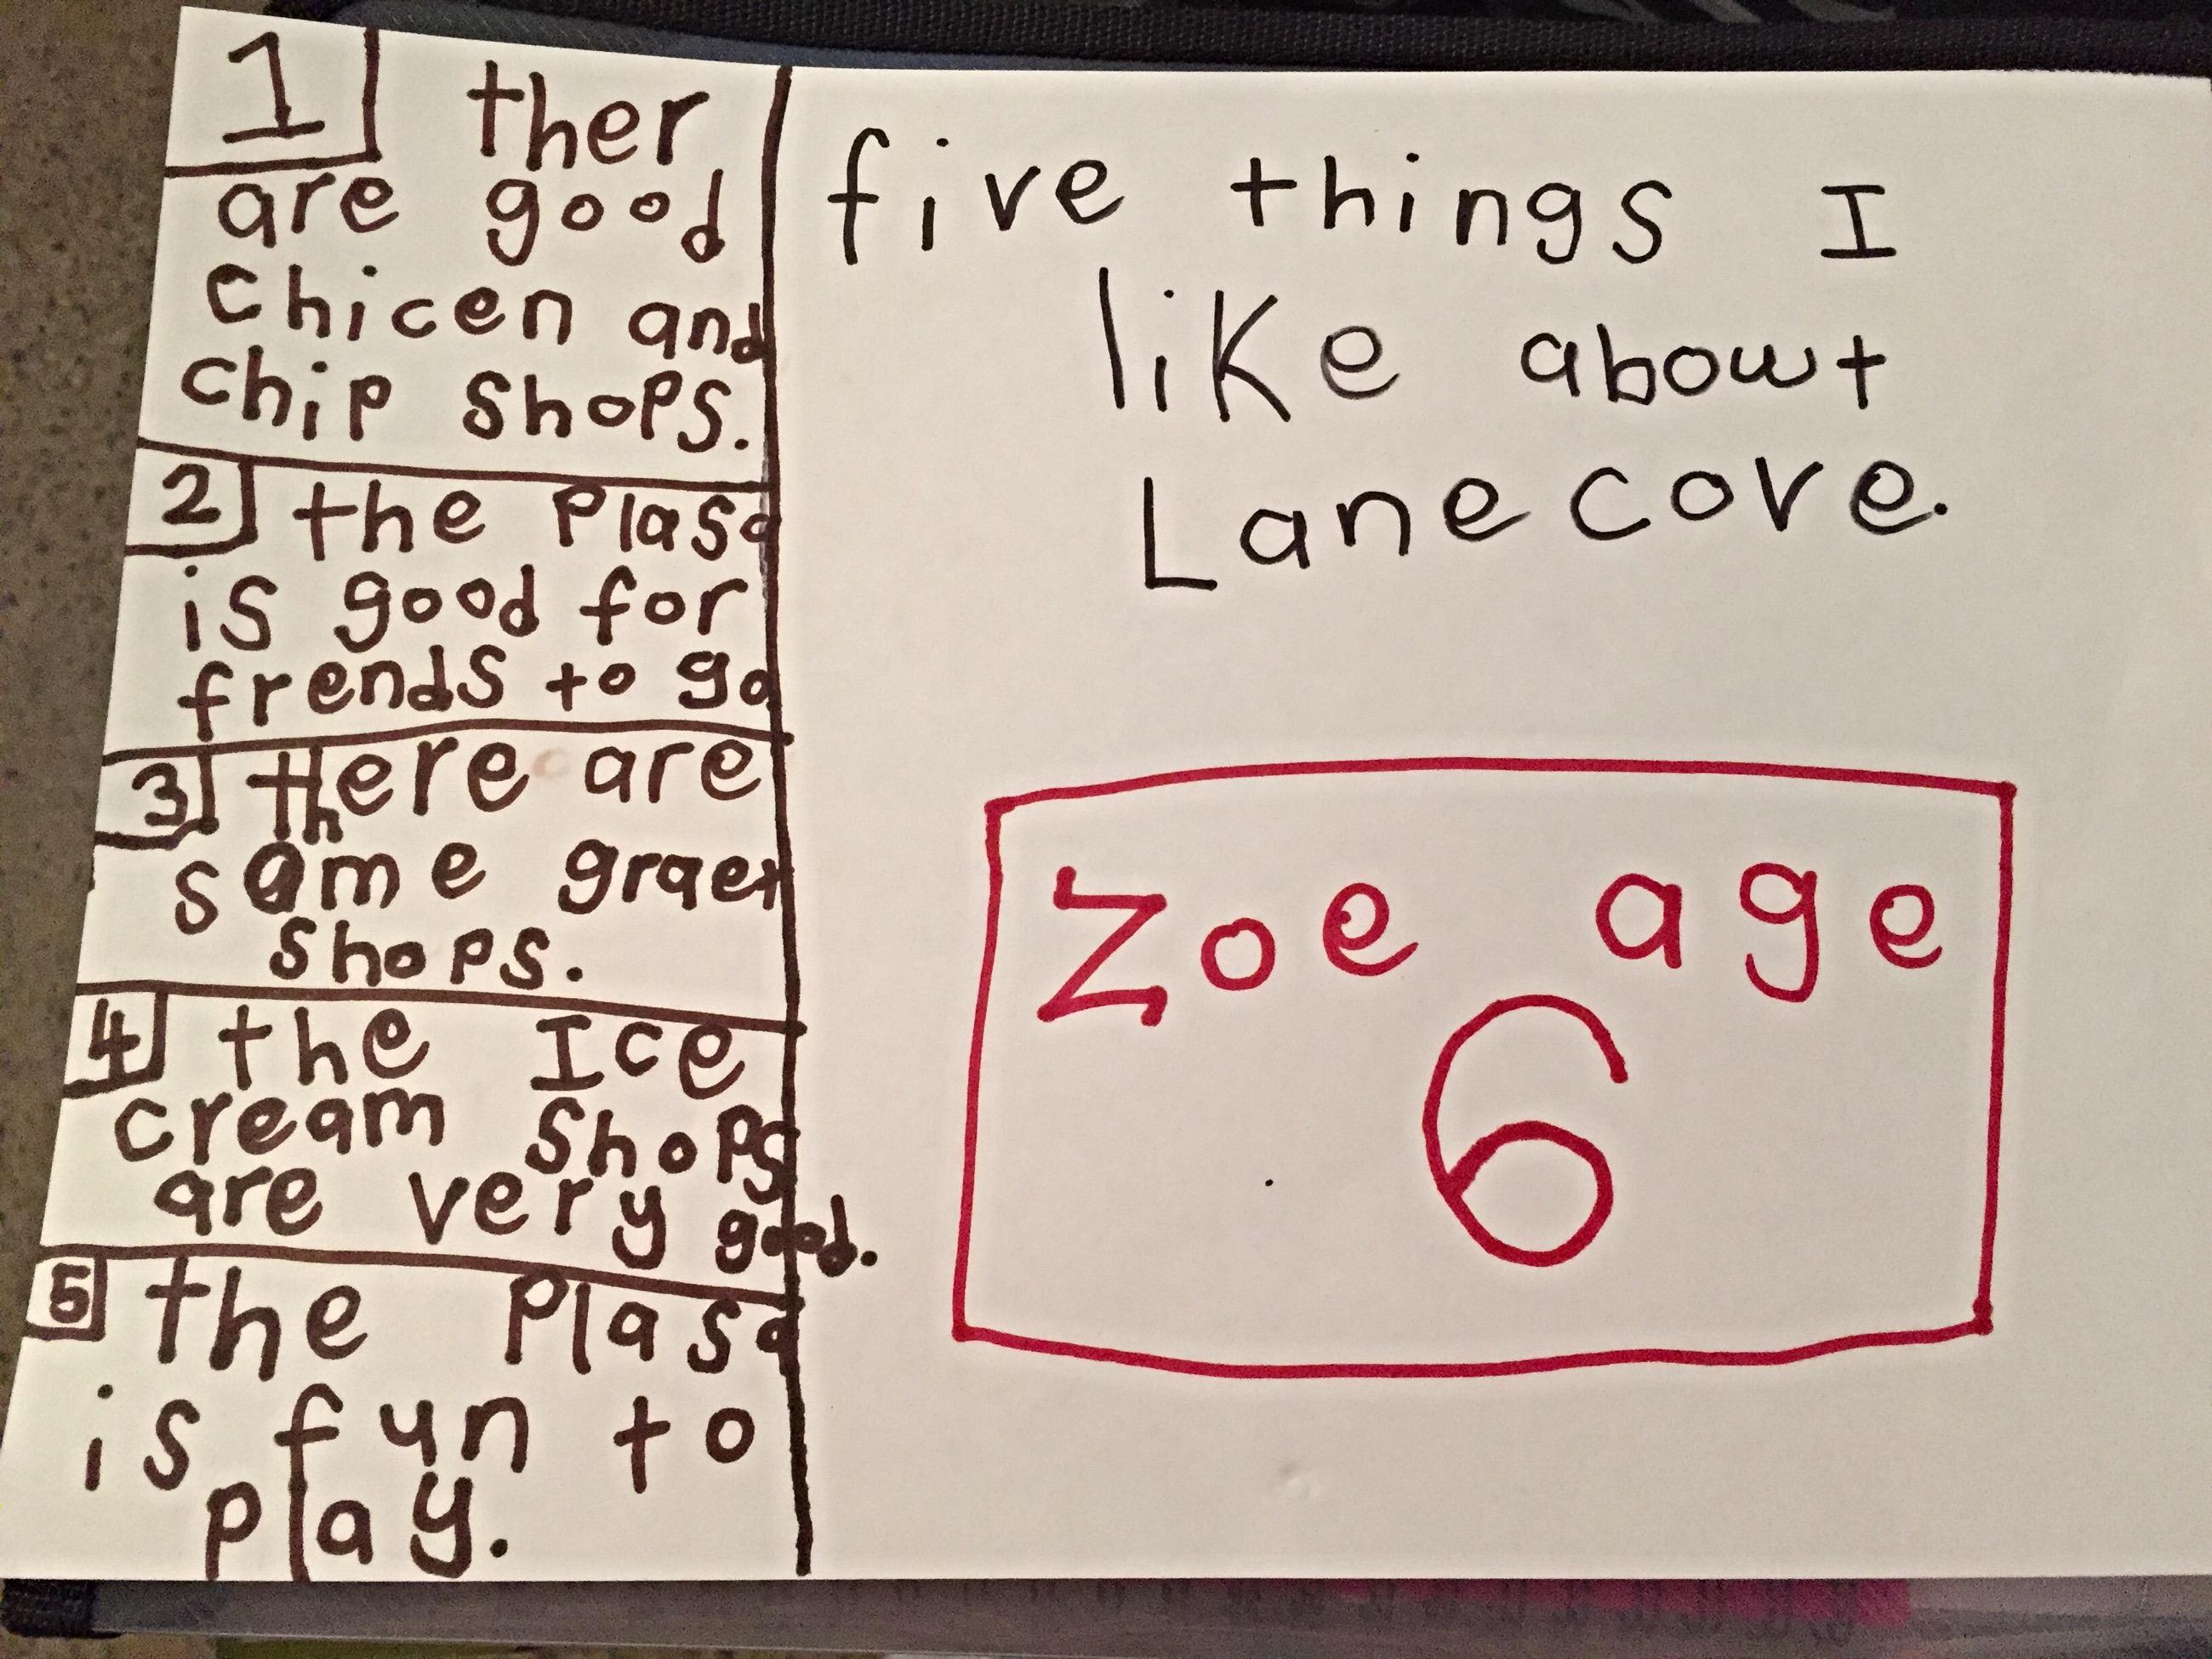 Kids in Lane Cove